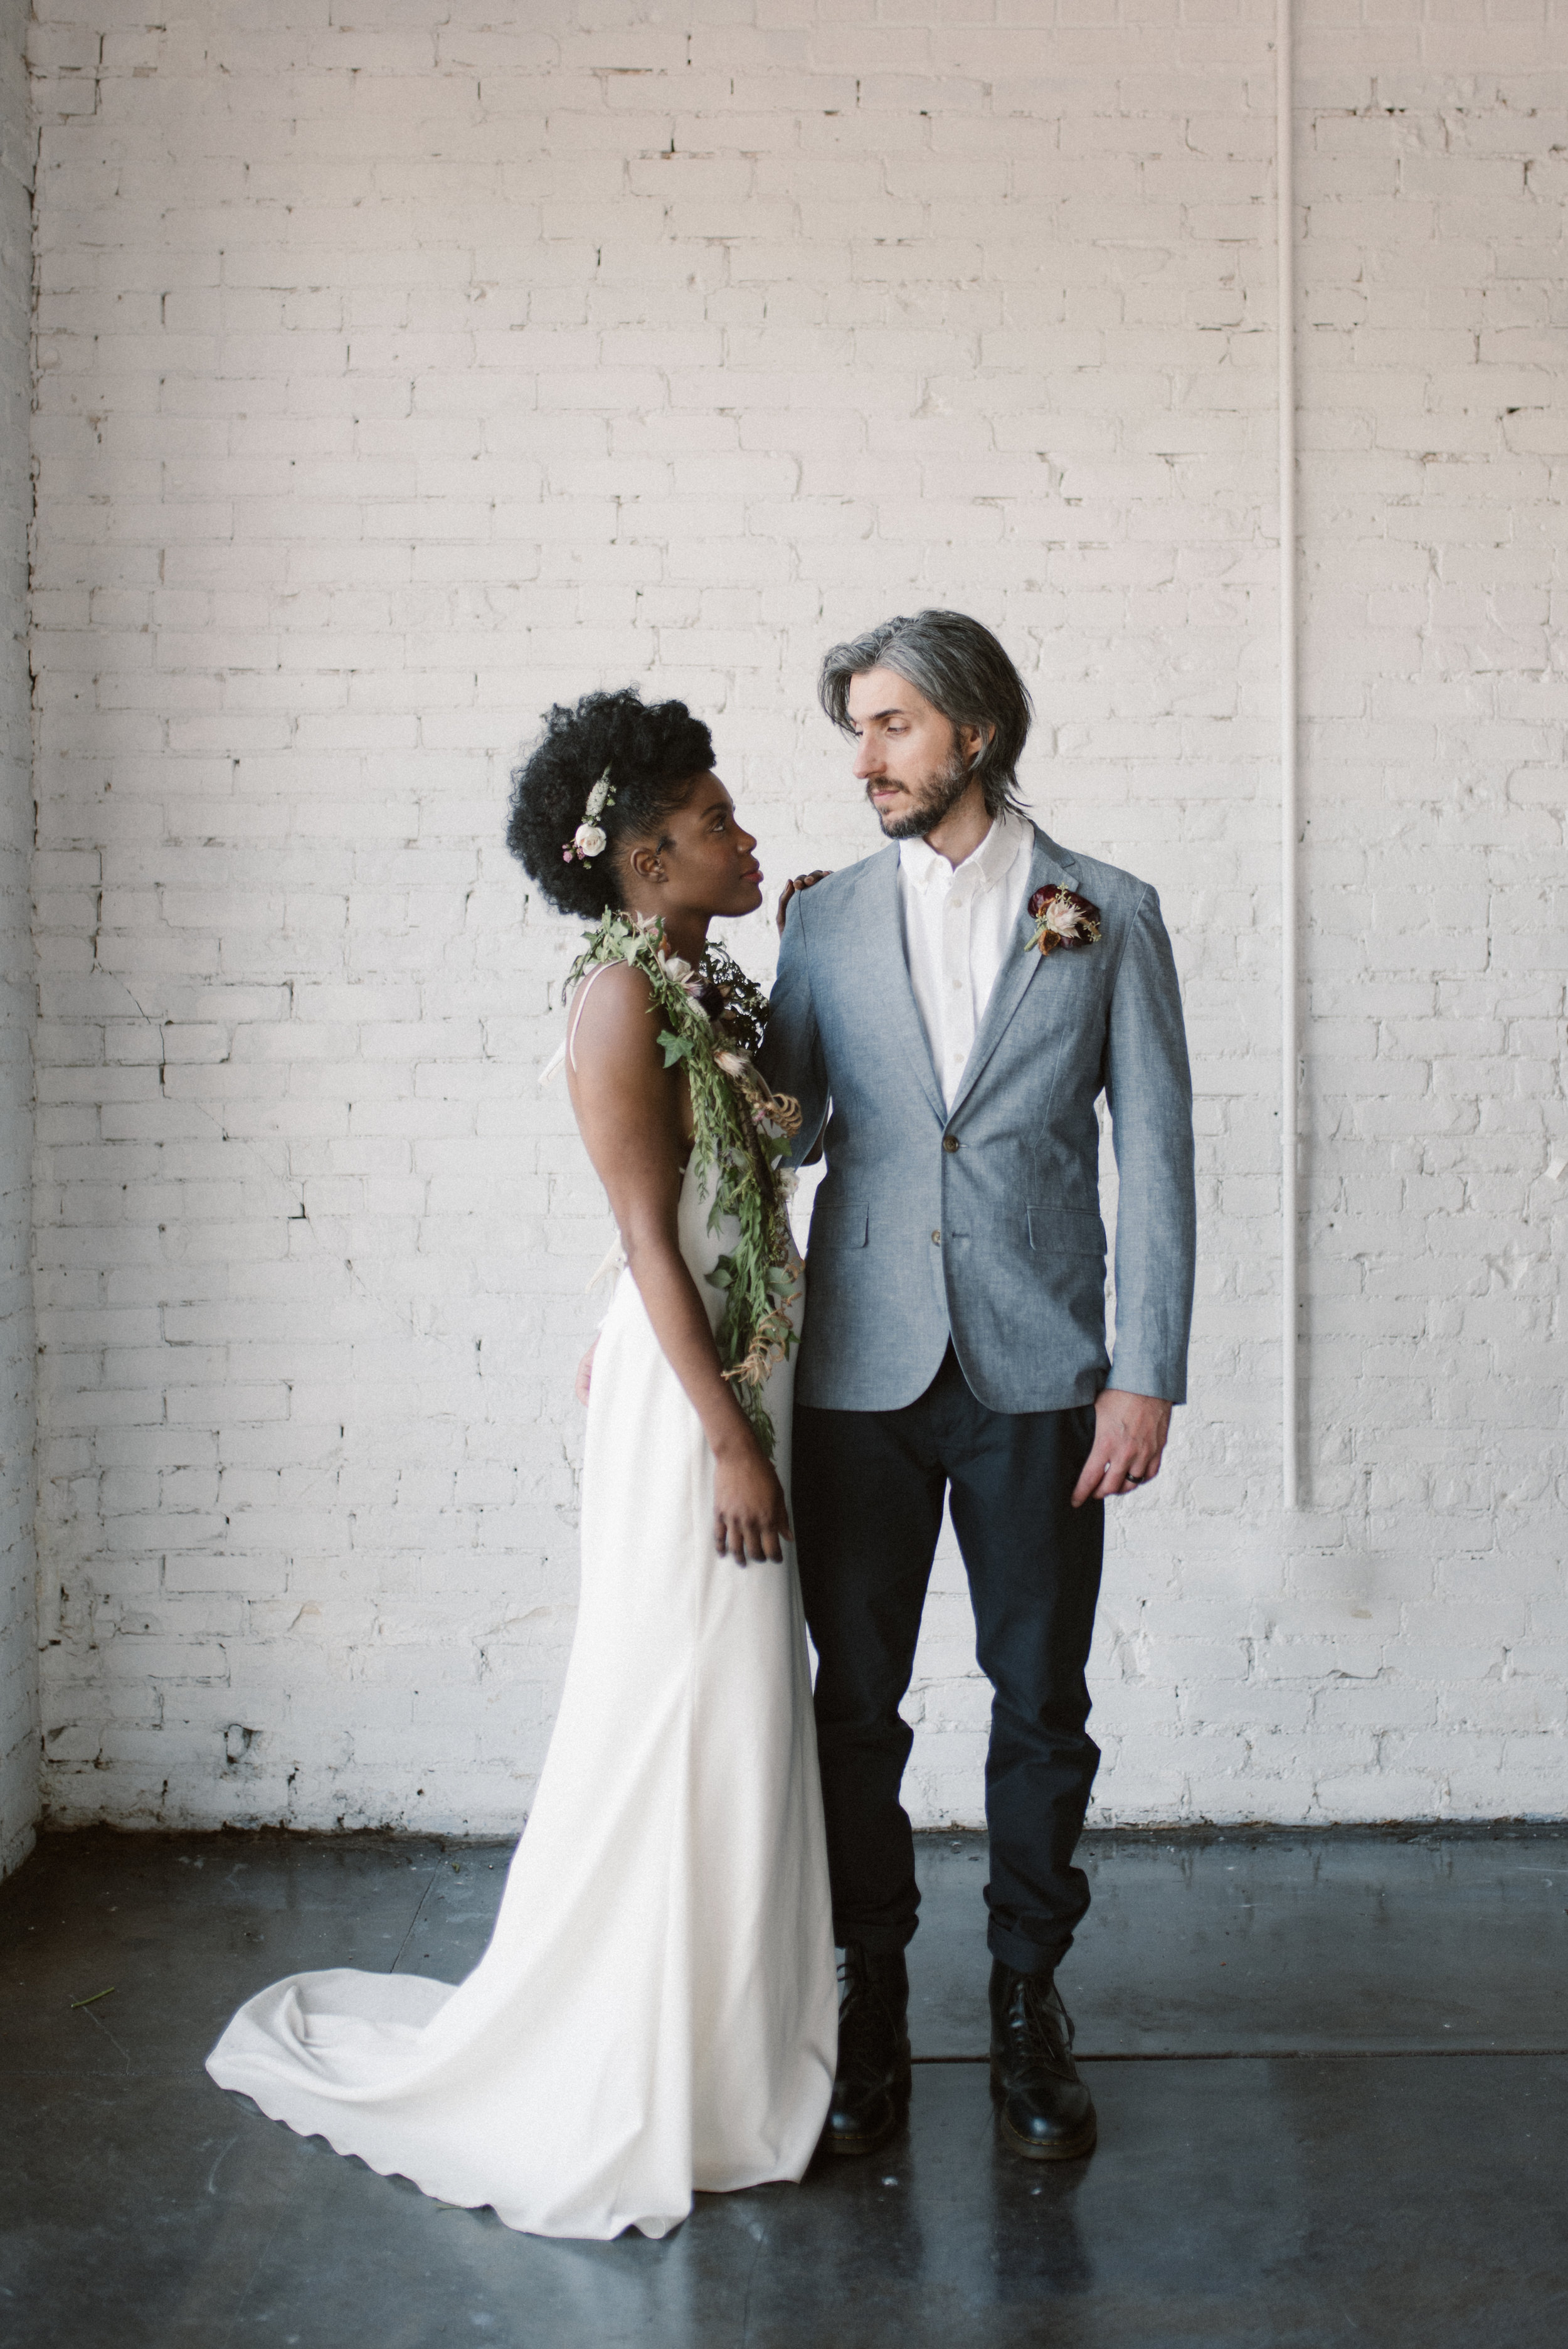 haus-820-minimal-editorial-wedding-styled-shoot-42.jpg